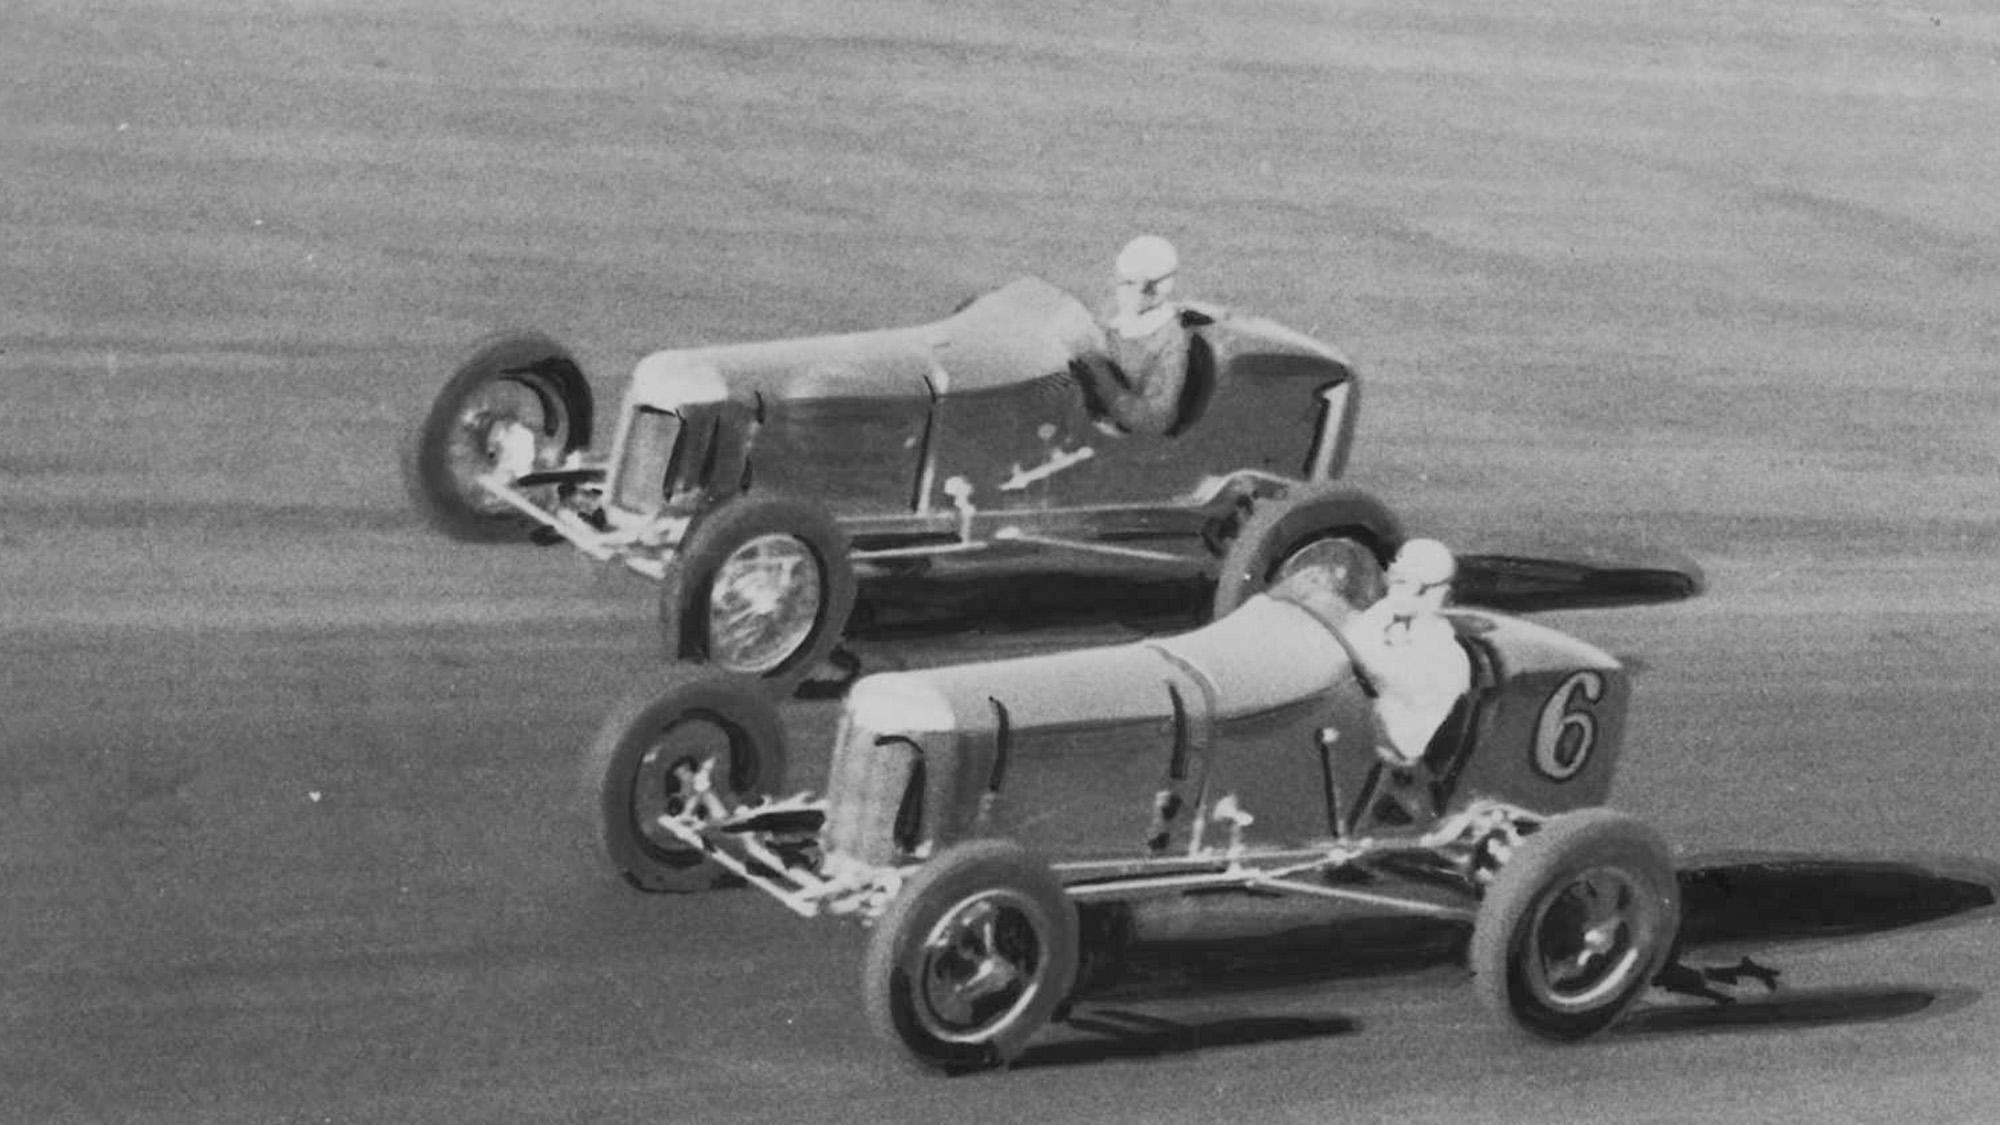 Bob Carey passes Ernie Triplett in the 1933 100-mile classic